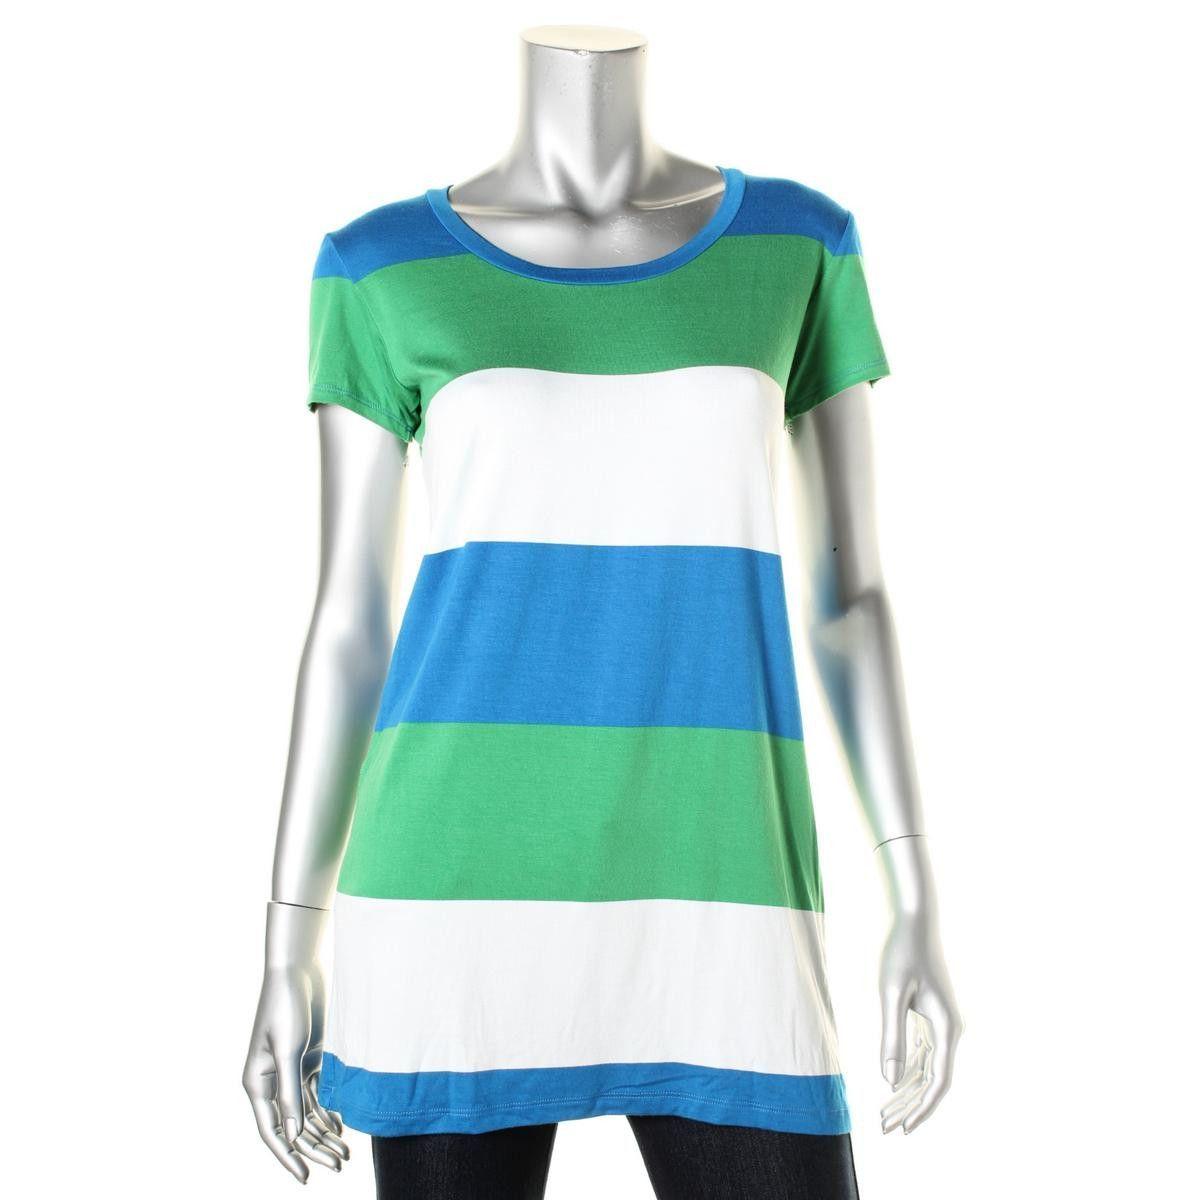 Tommy Bahama Womens Jersey Tunic Tunic Top